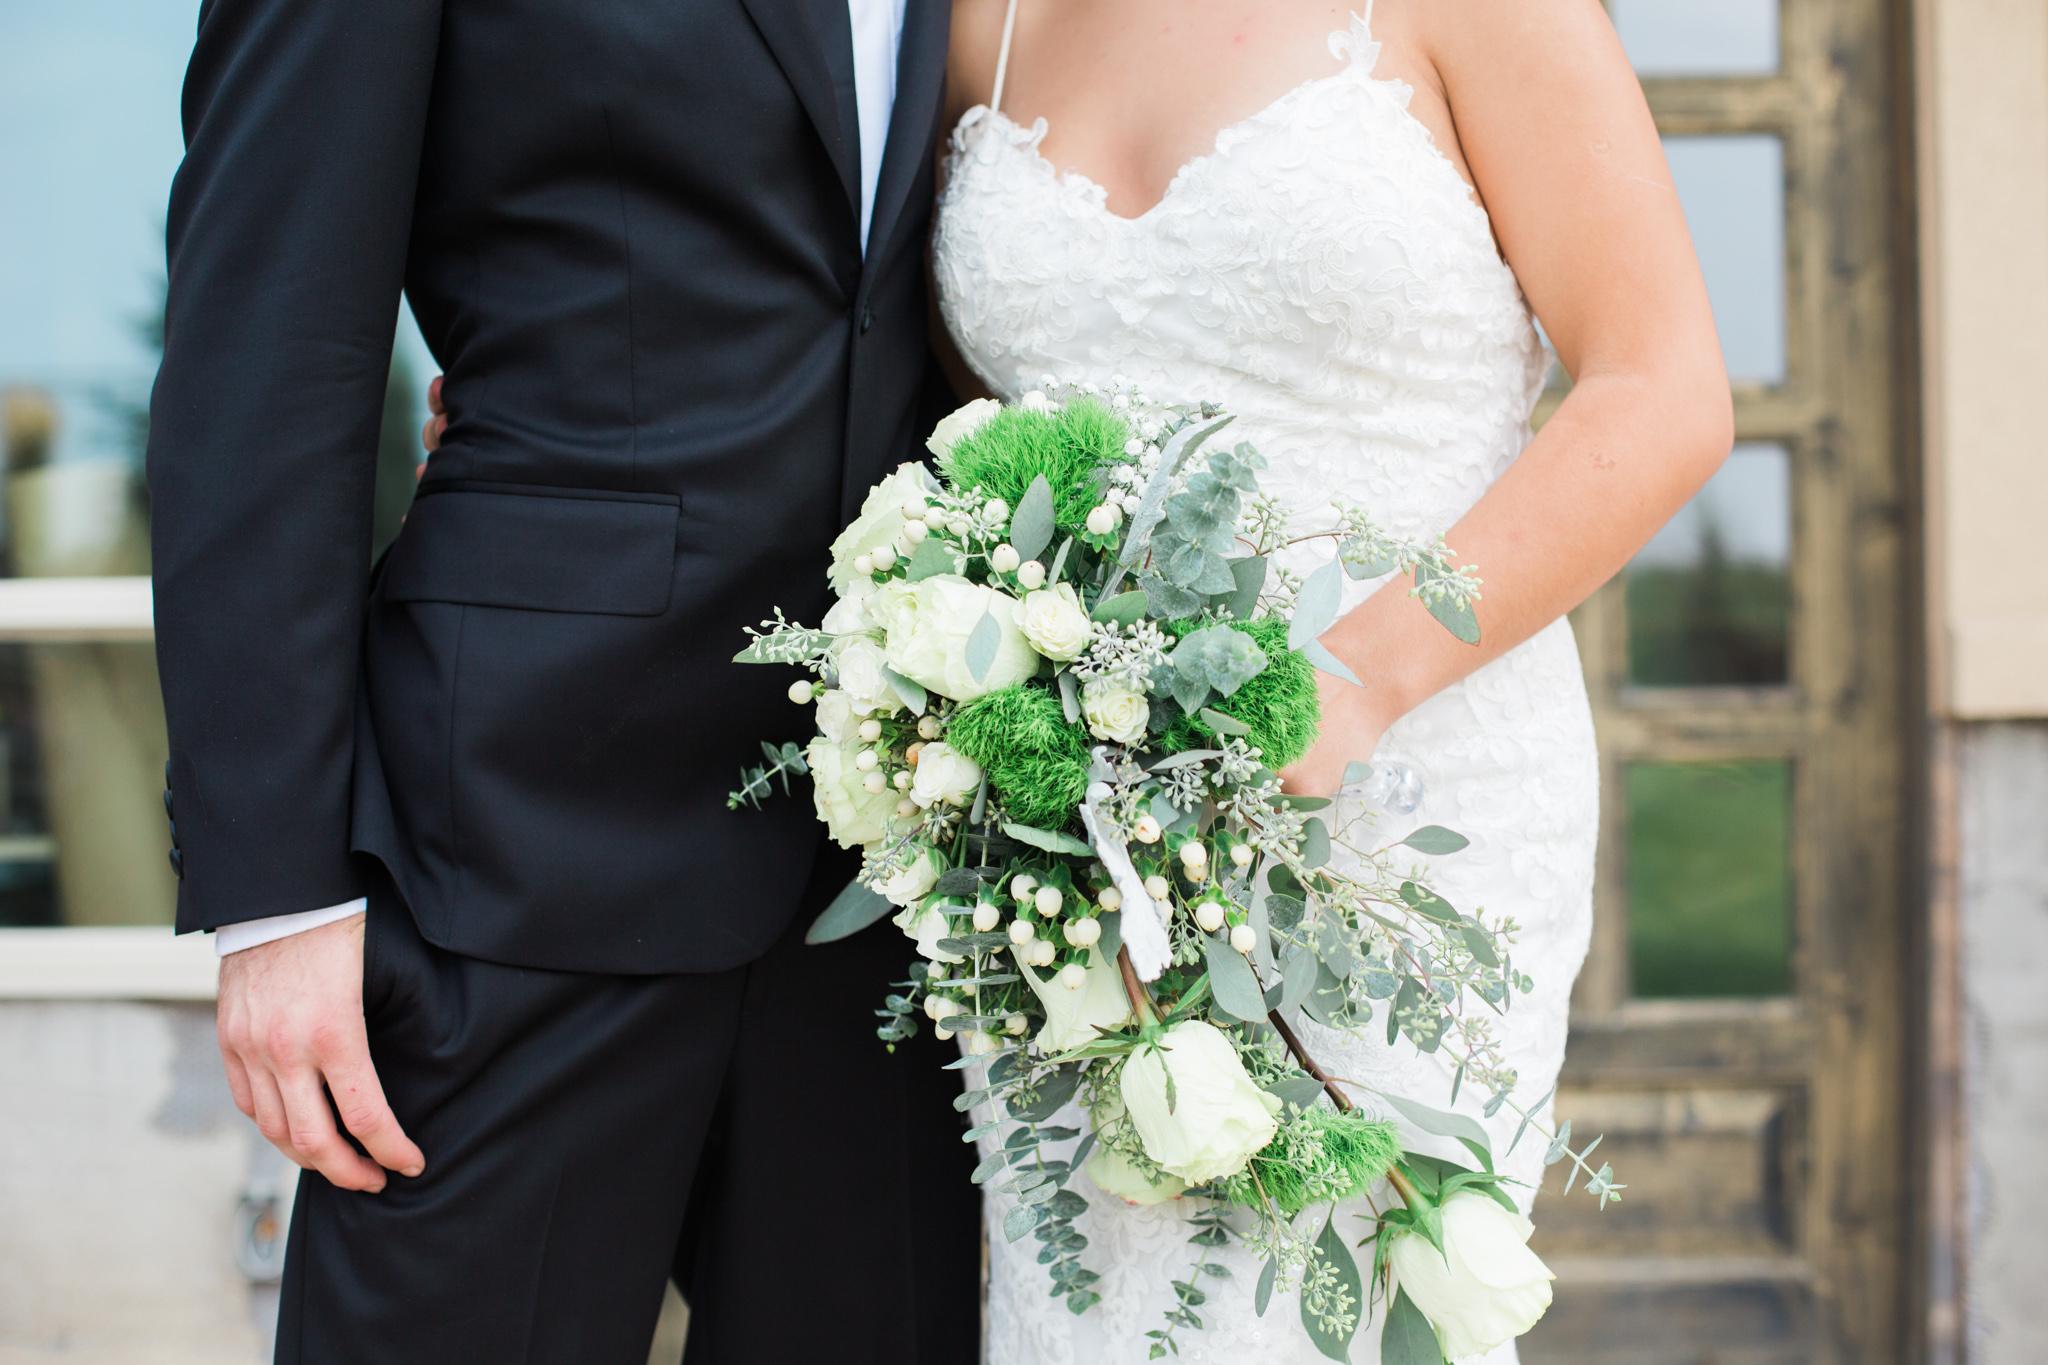 Olga_janni_wedding_090917_WEBSIZE (199 of 704).JPG